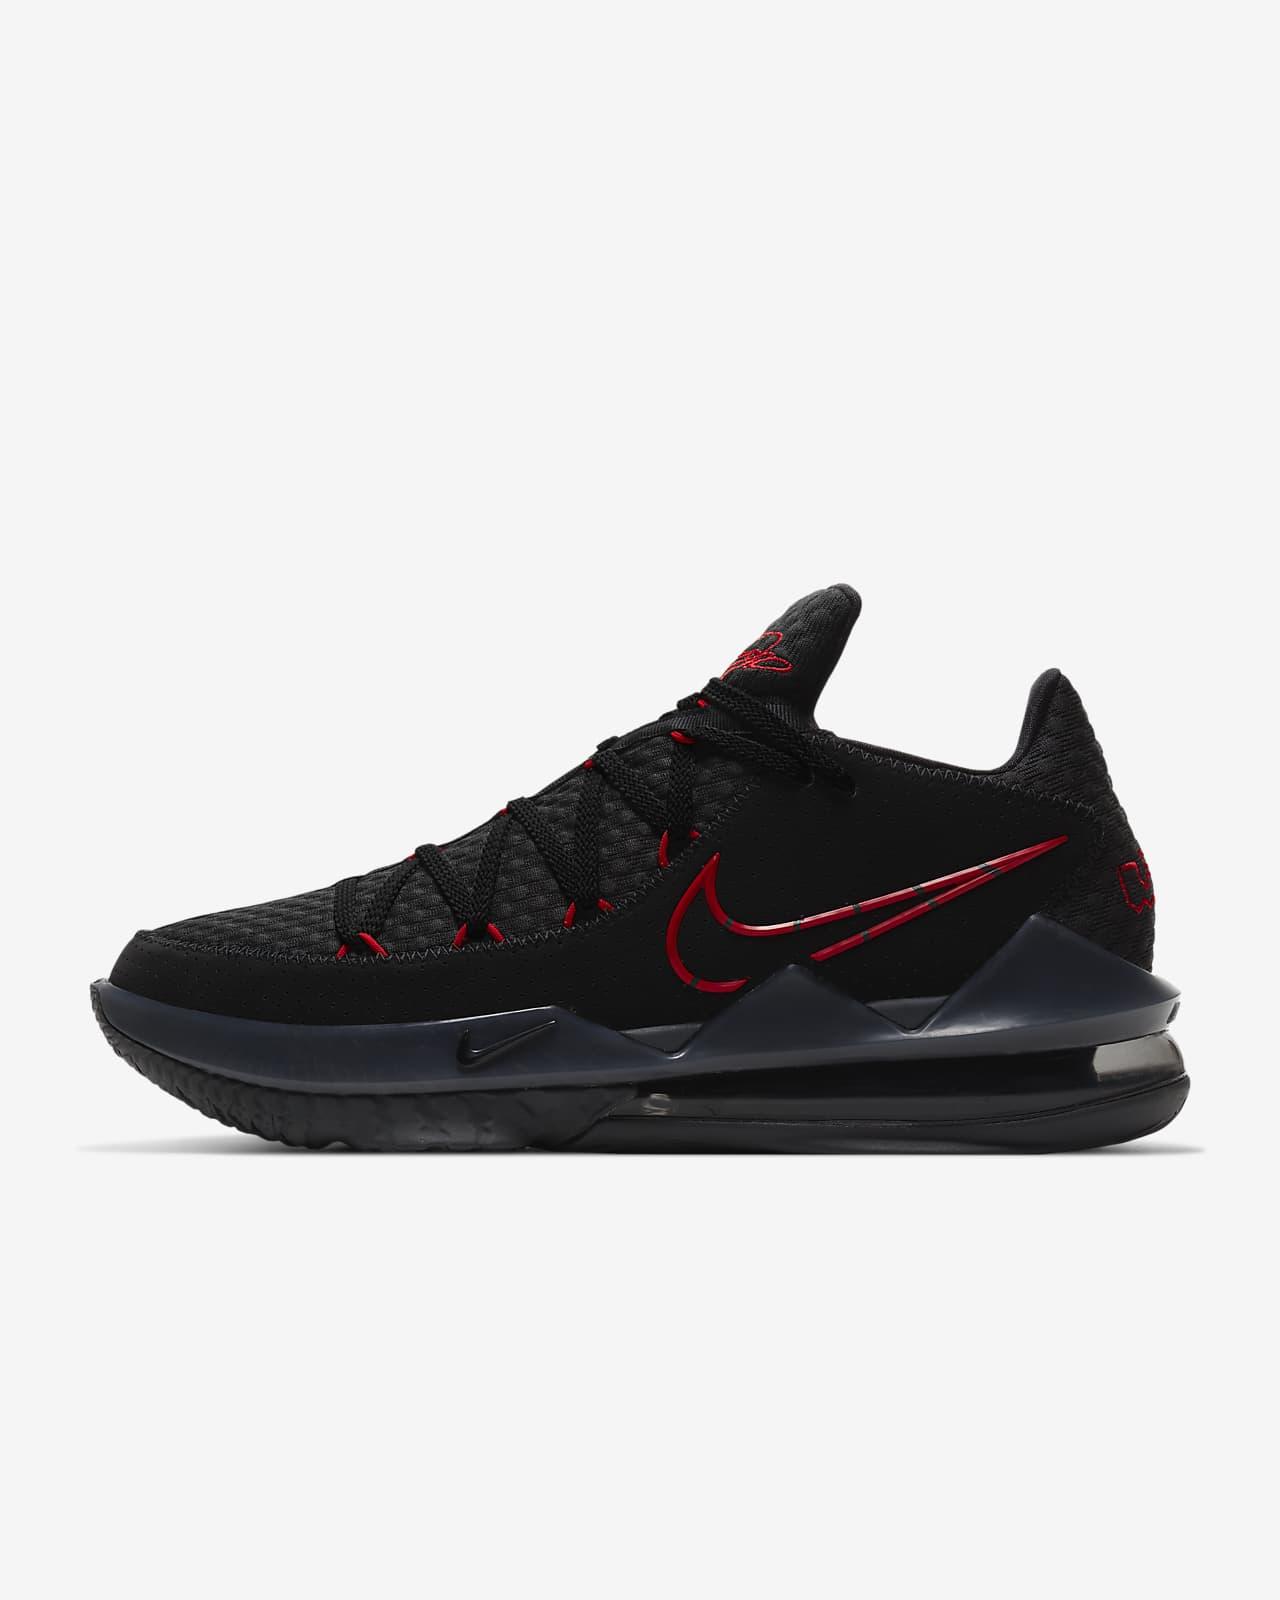 LeBron 17 Low Basketball Shoe. Nike NL